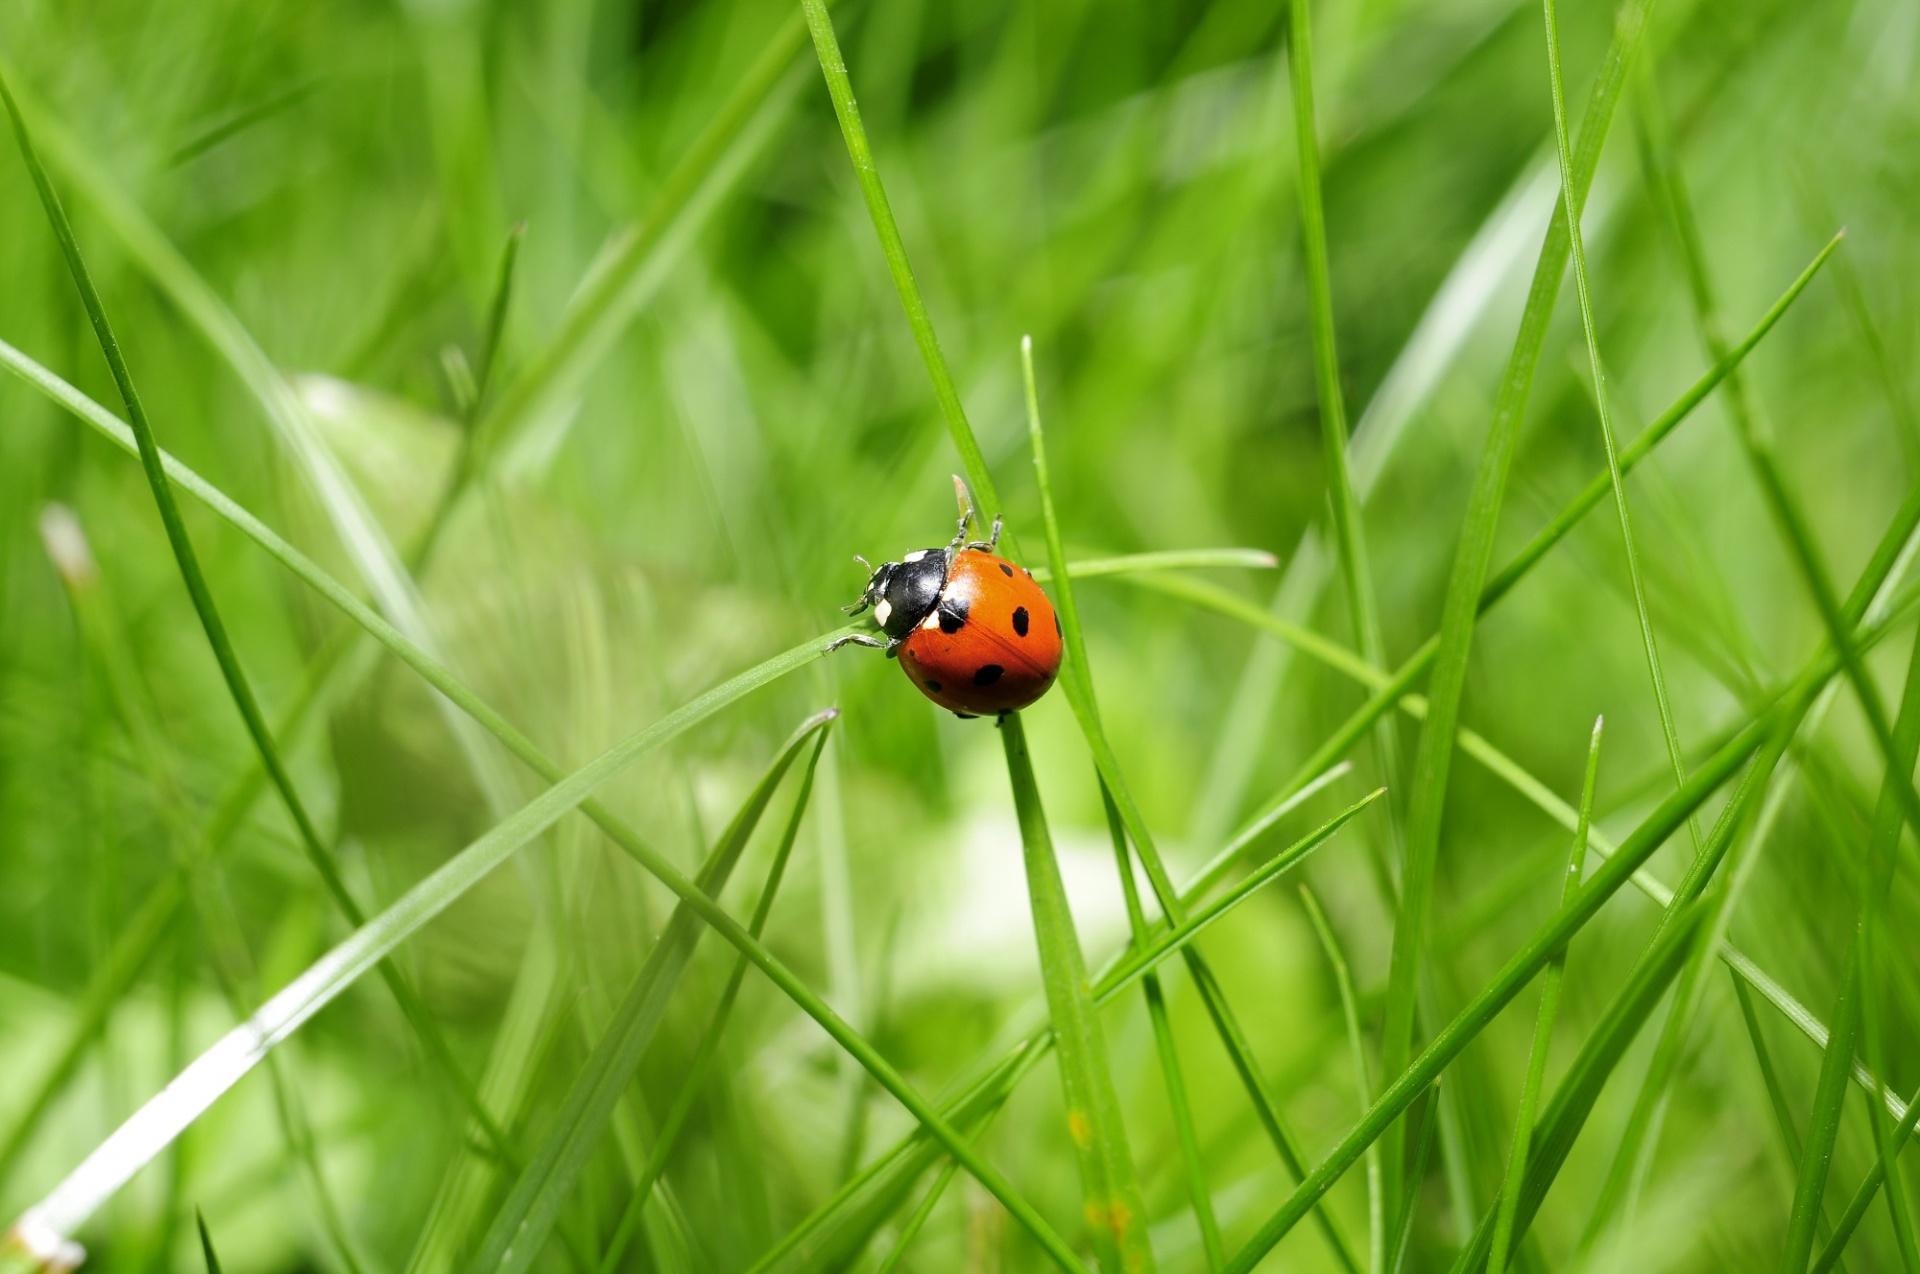 ladybug-in-the-grass.jpg